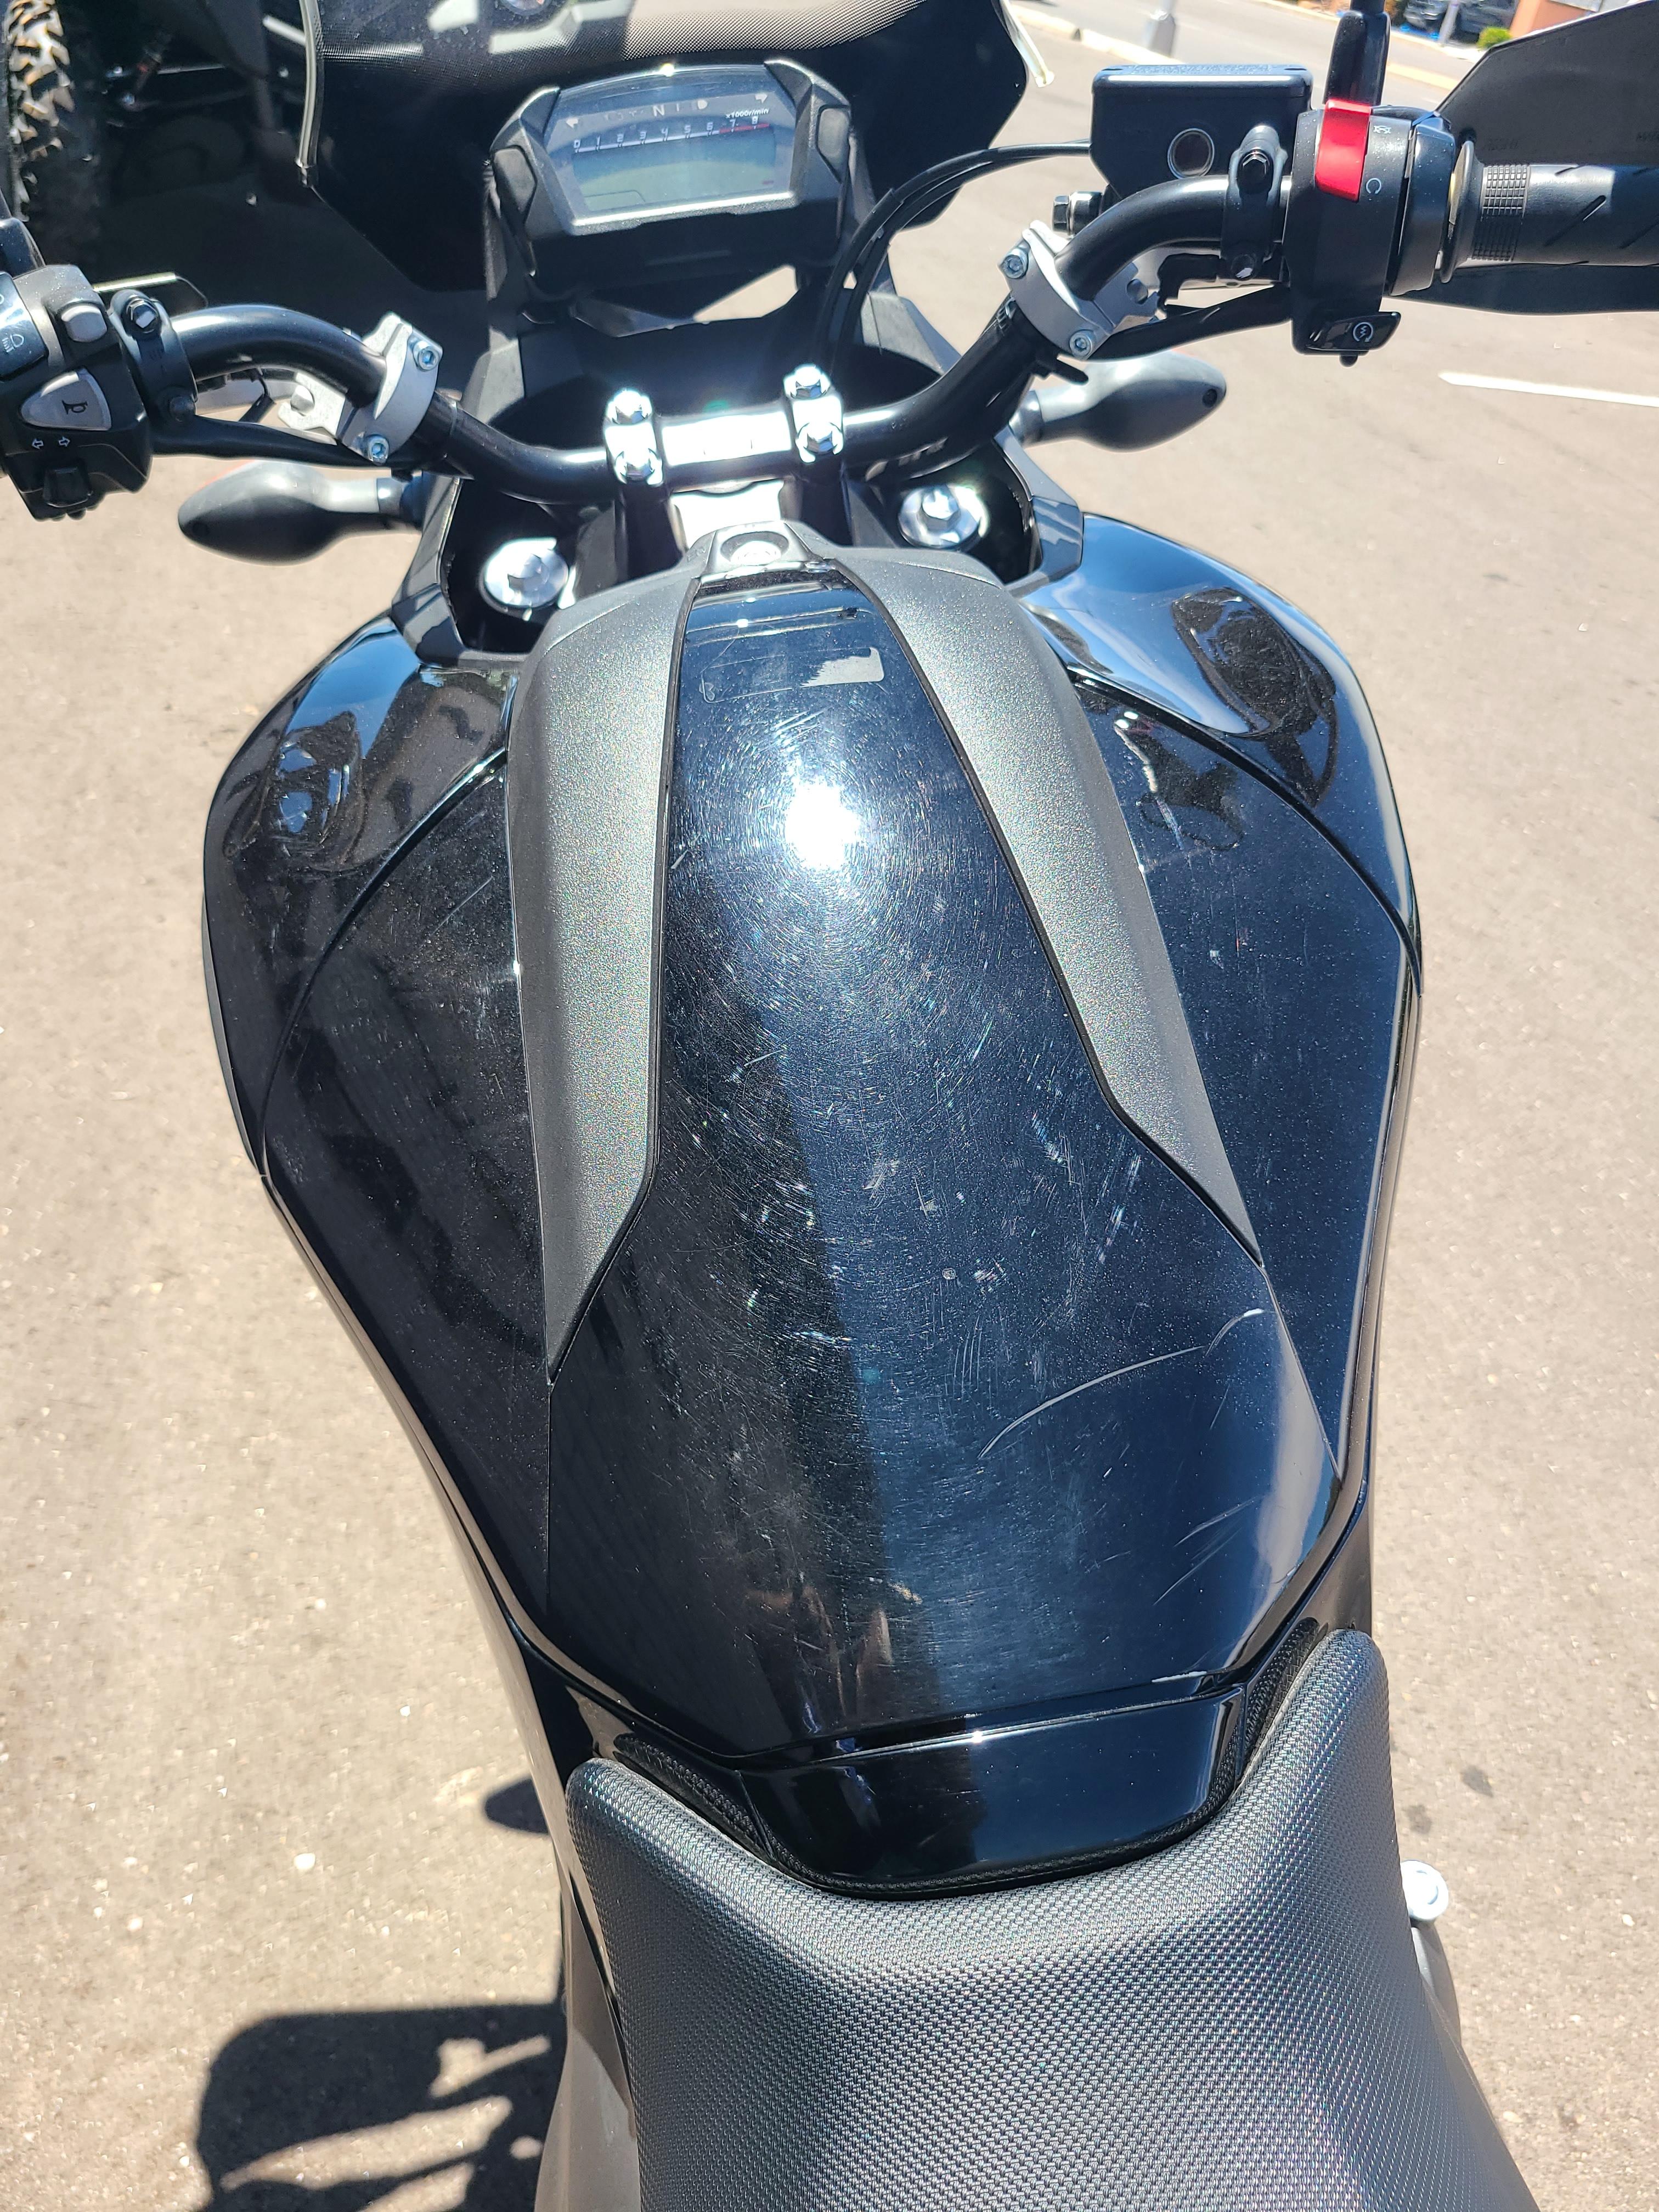 2014 Honda NC700X Base at Bobby J's Yamaha, Albuquerque, NM 87110